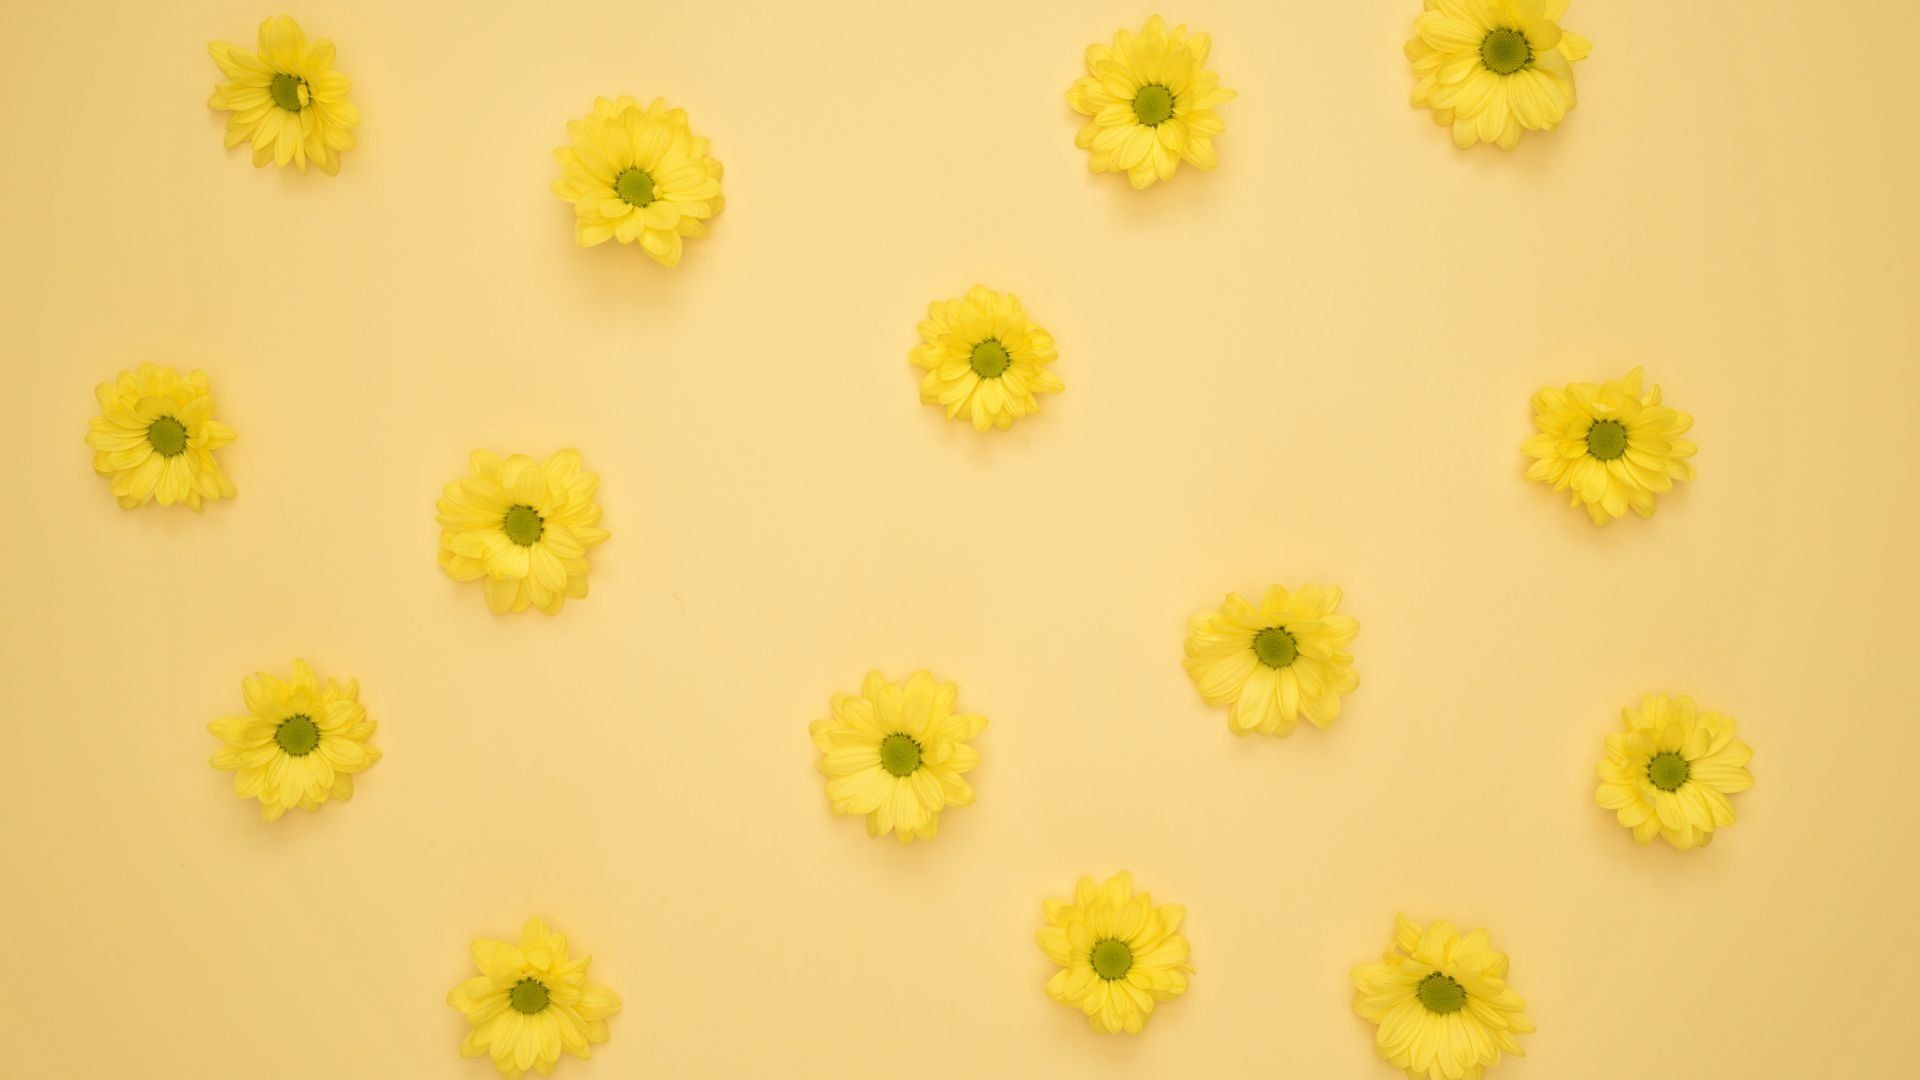 yellow aesthetic pc wallpaper